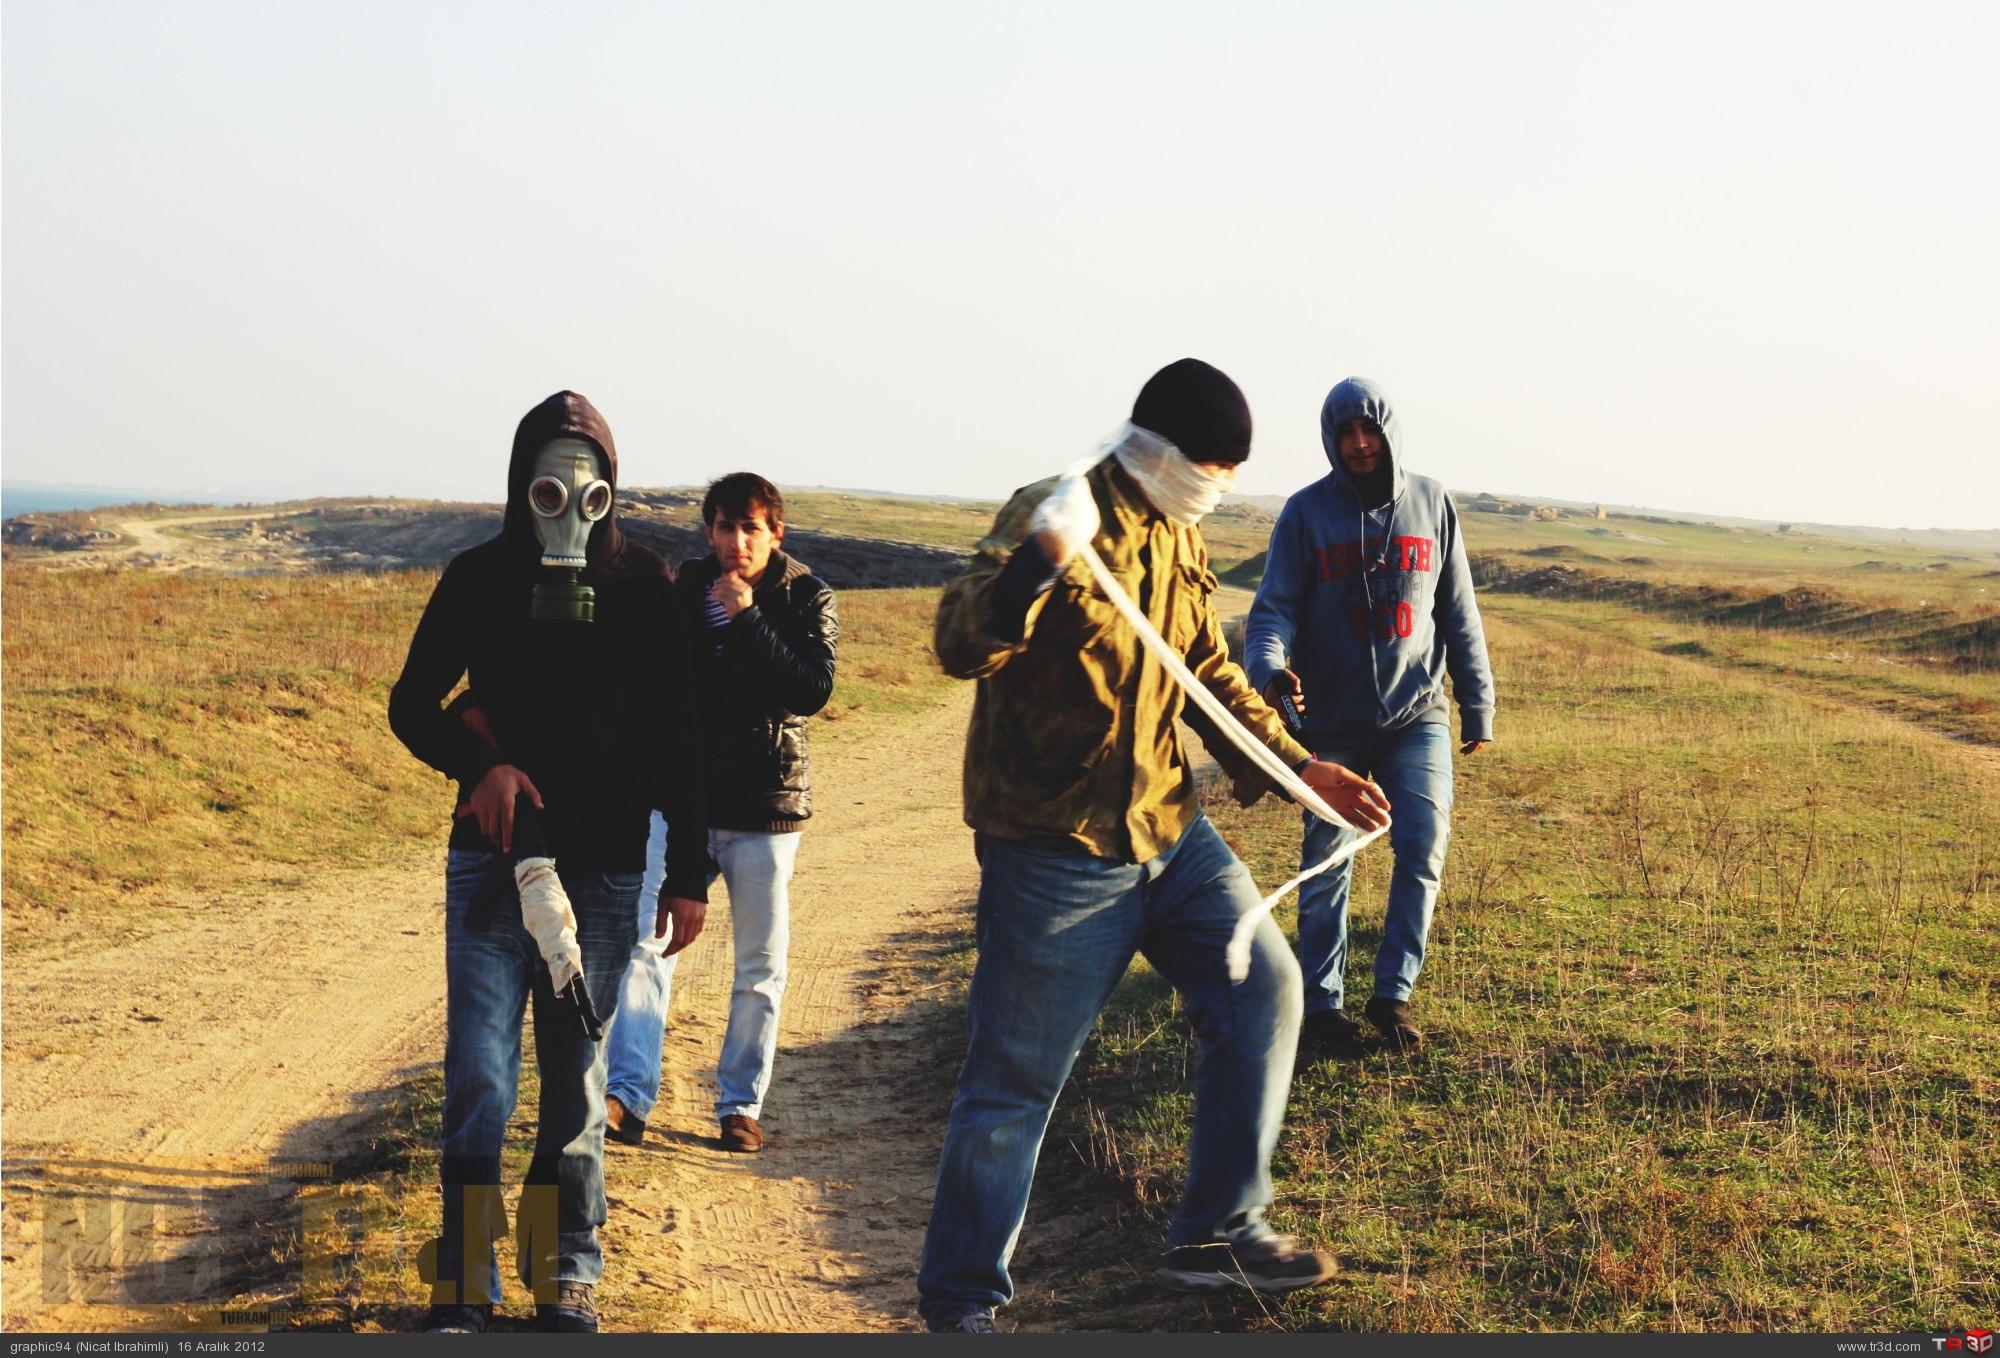 APOCALYPTIC 21.12.2012 (SHORT FILM) 1